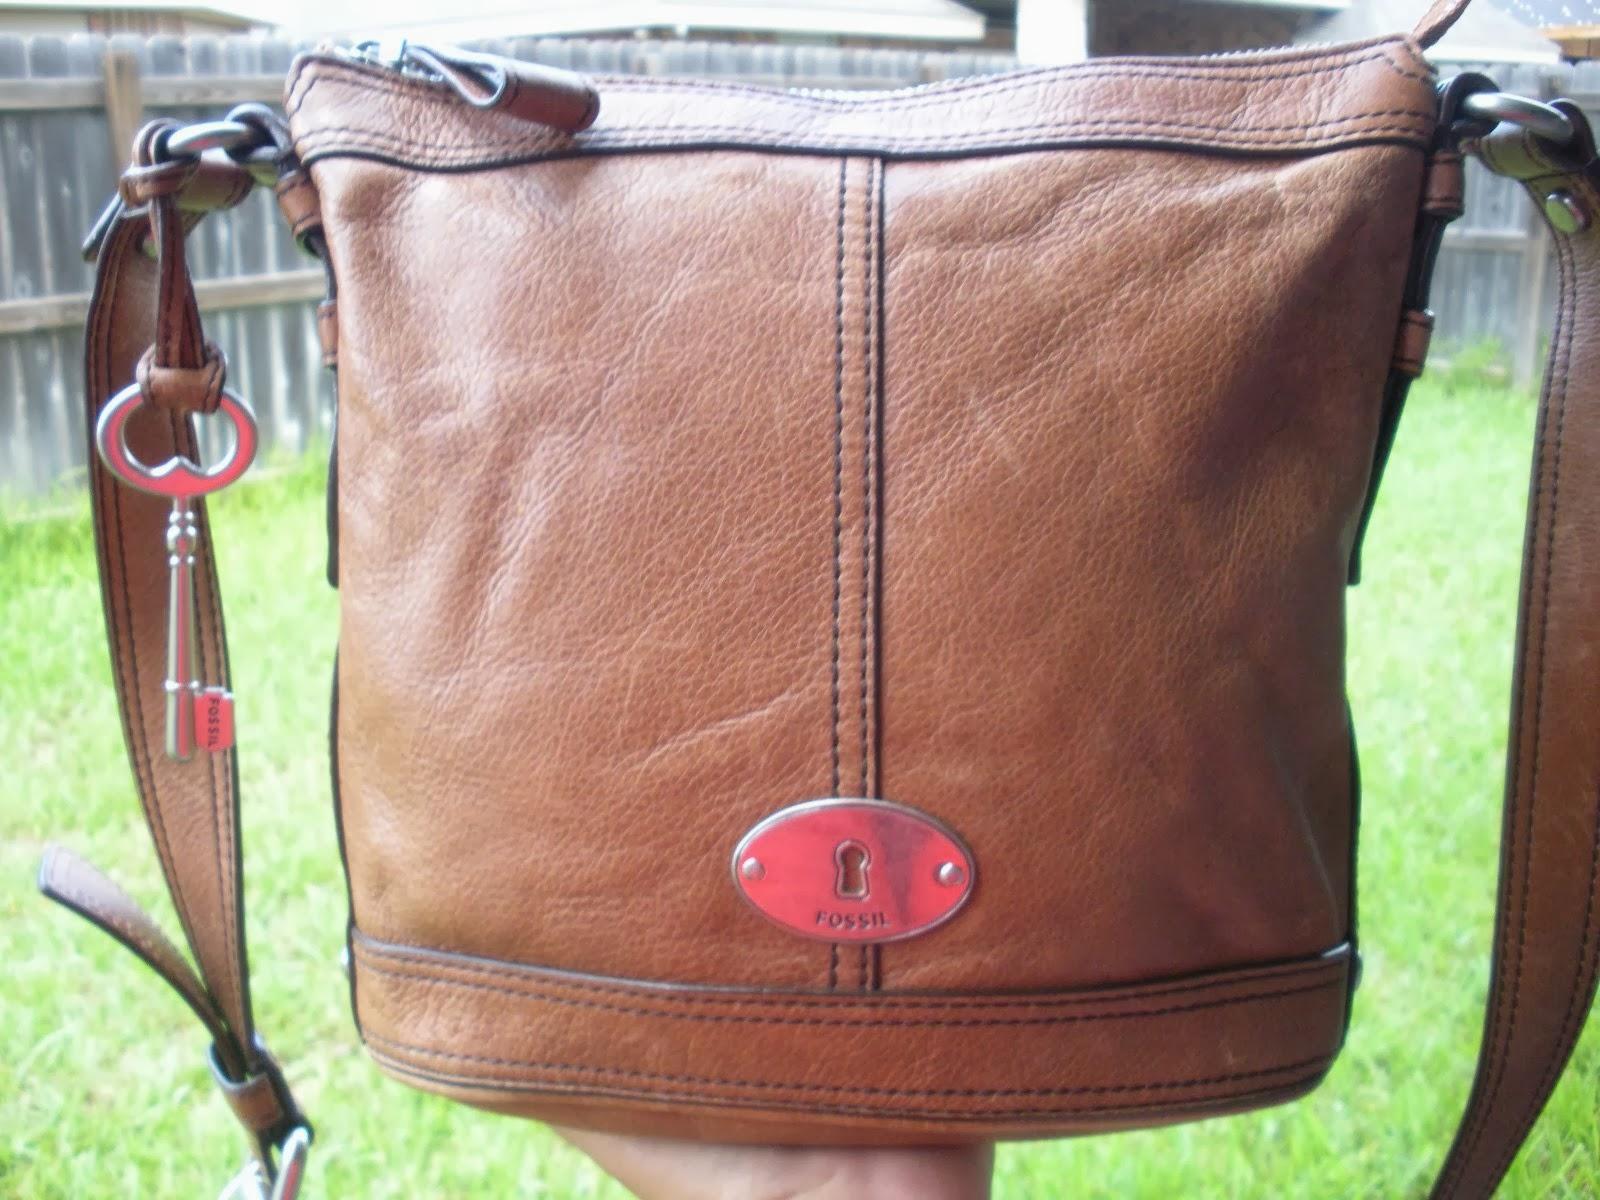 e6ae5f42be FOSSIL Caramel Tan Bucket Crossbody Shoulder Bag Purse Shopper Tote Satchel